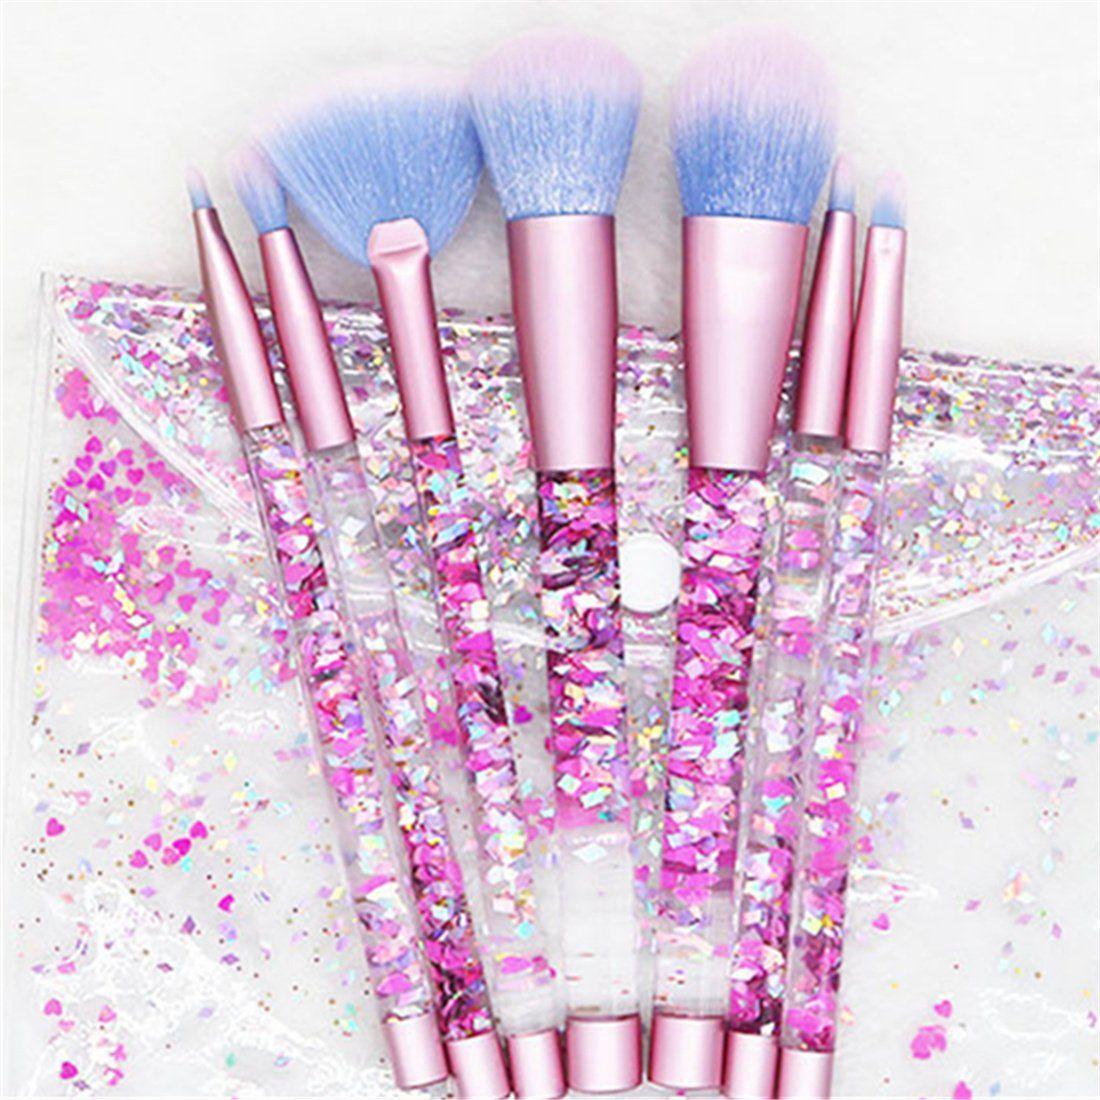 King Love Star New Makeup Brushes 7 Pieces/Set Quicksand